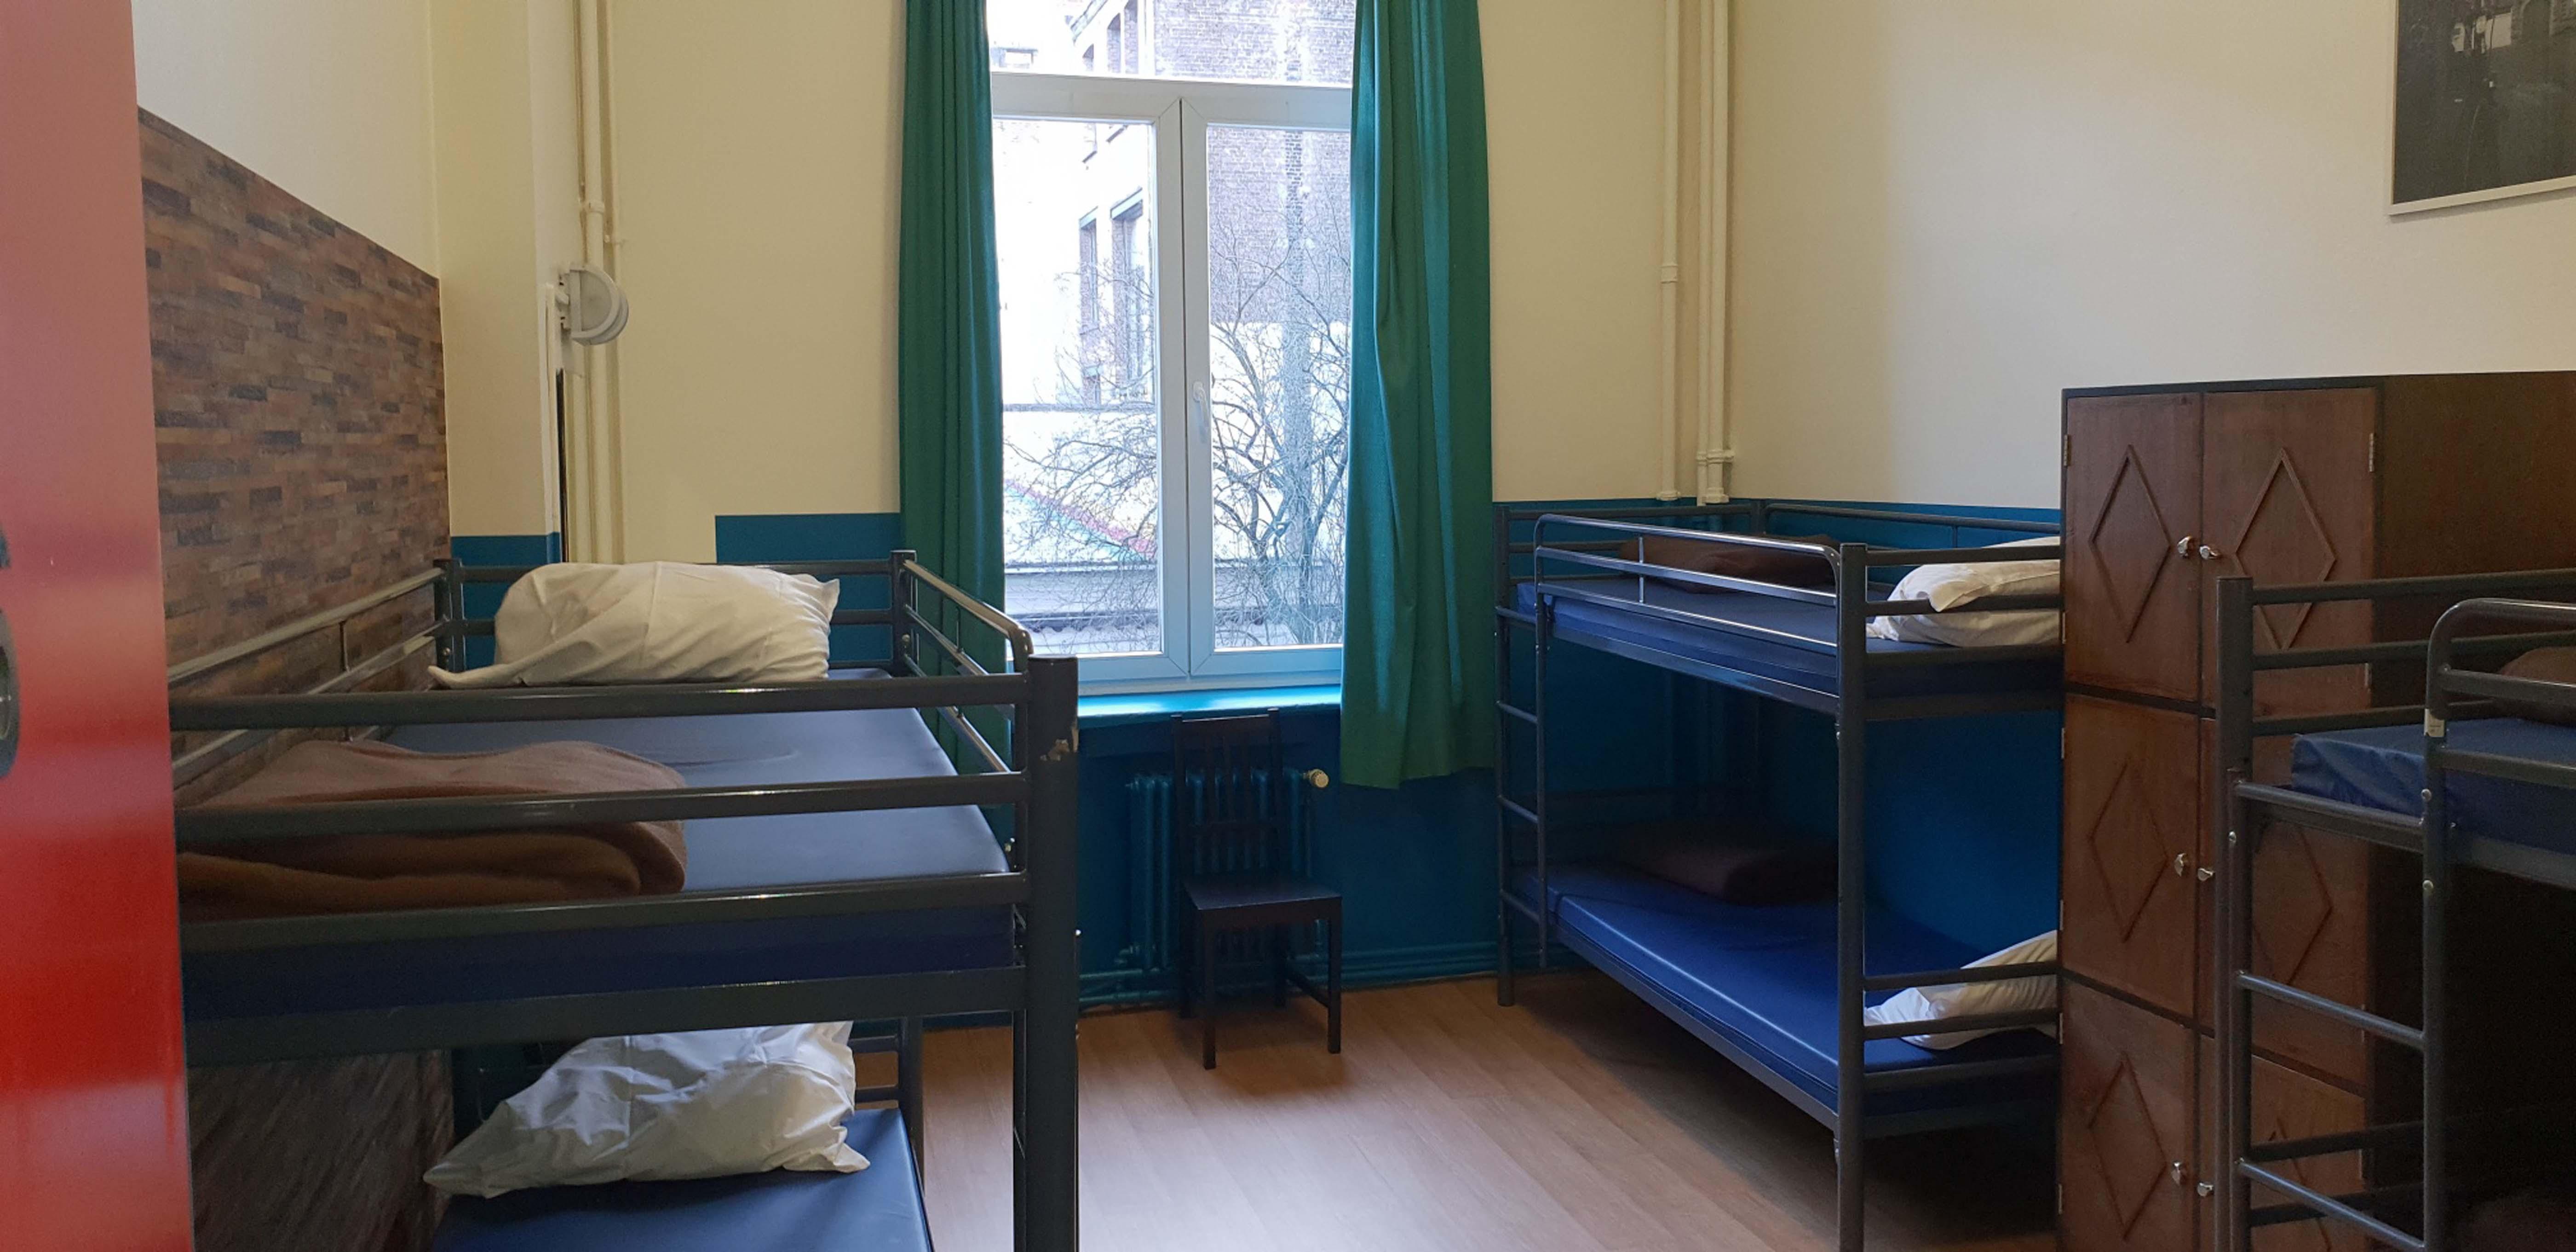 Map Of Youth Hostels In Ireland.Youth Hostel Van Gogh Chab In Brussels Belgium Hostel